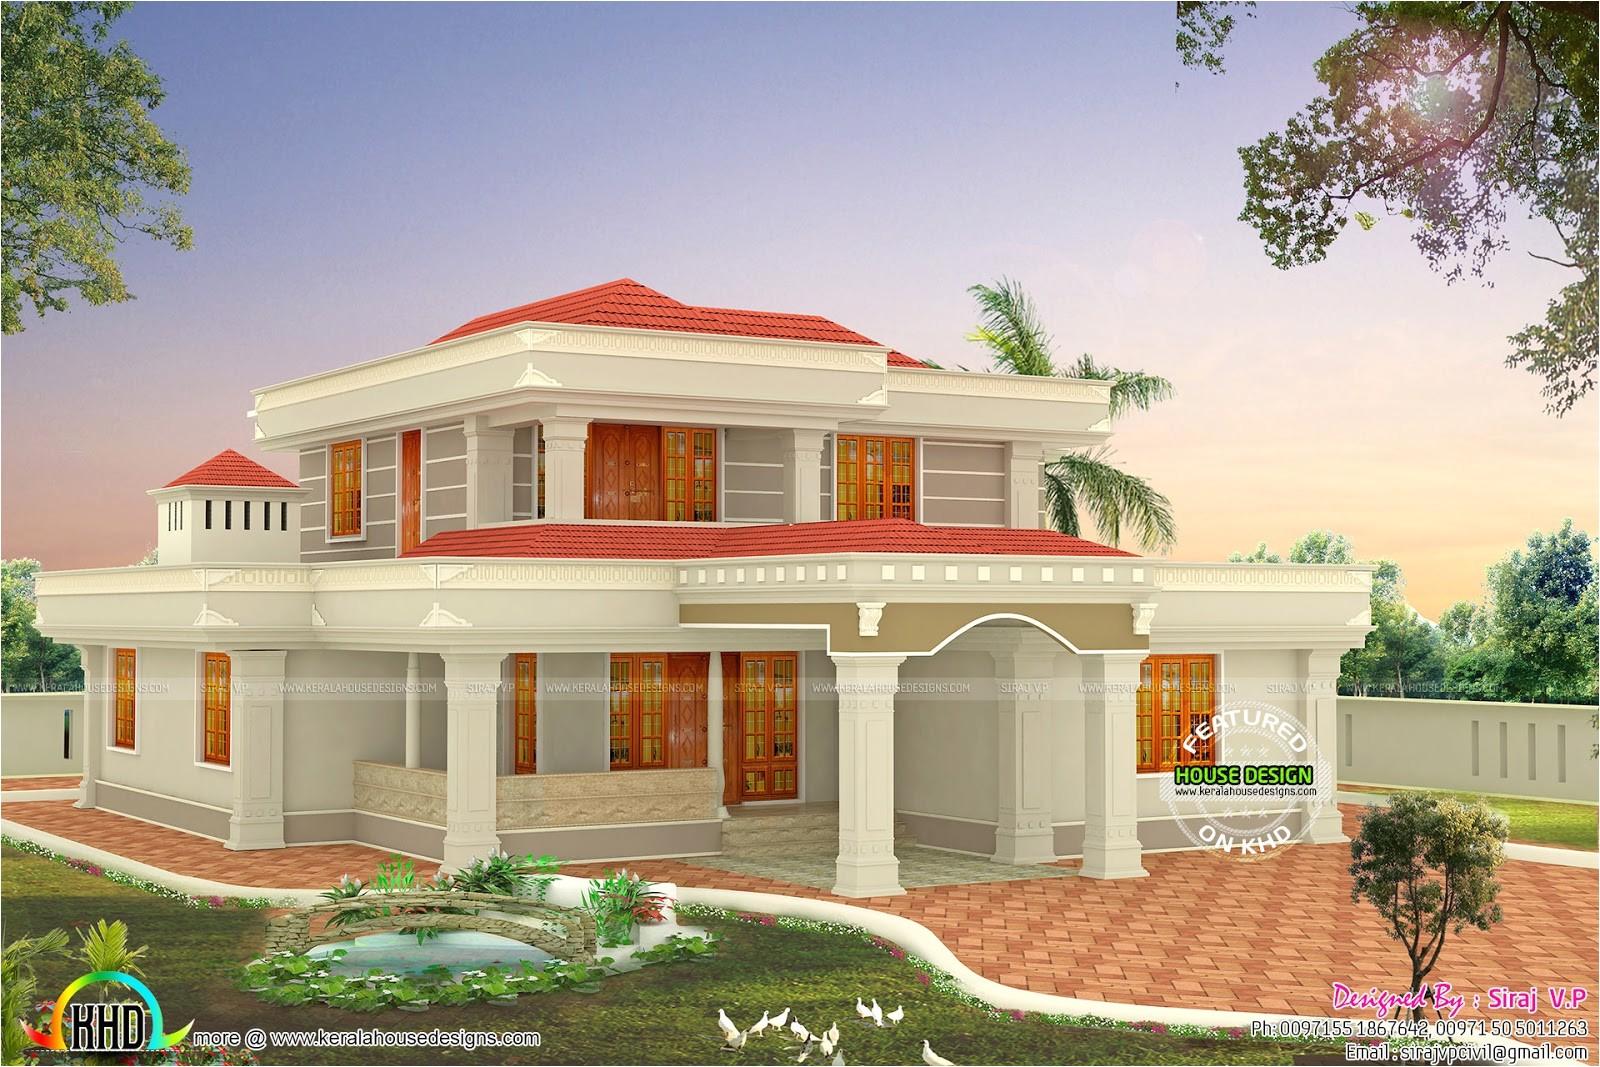 best beach house designs